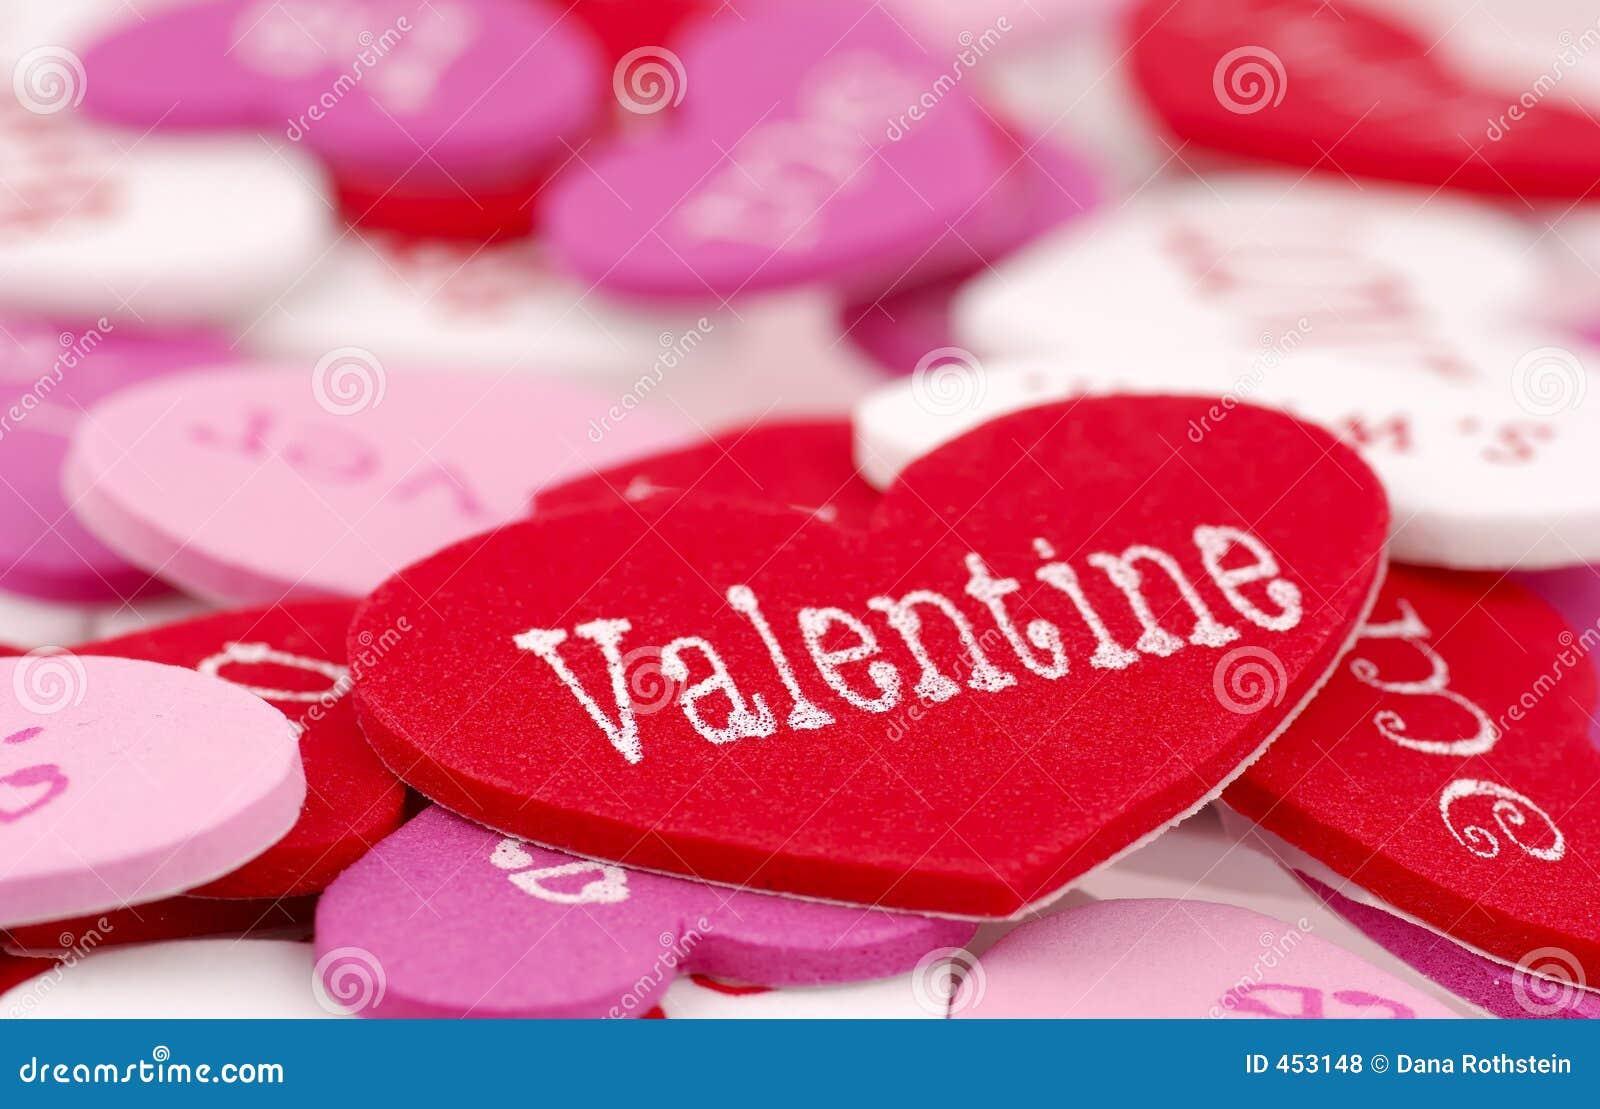 Download Valentine stock photo. Image of feelings, background, symbols - 453148